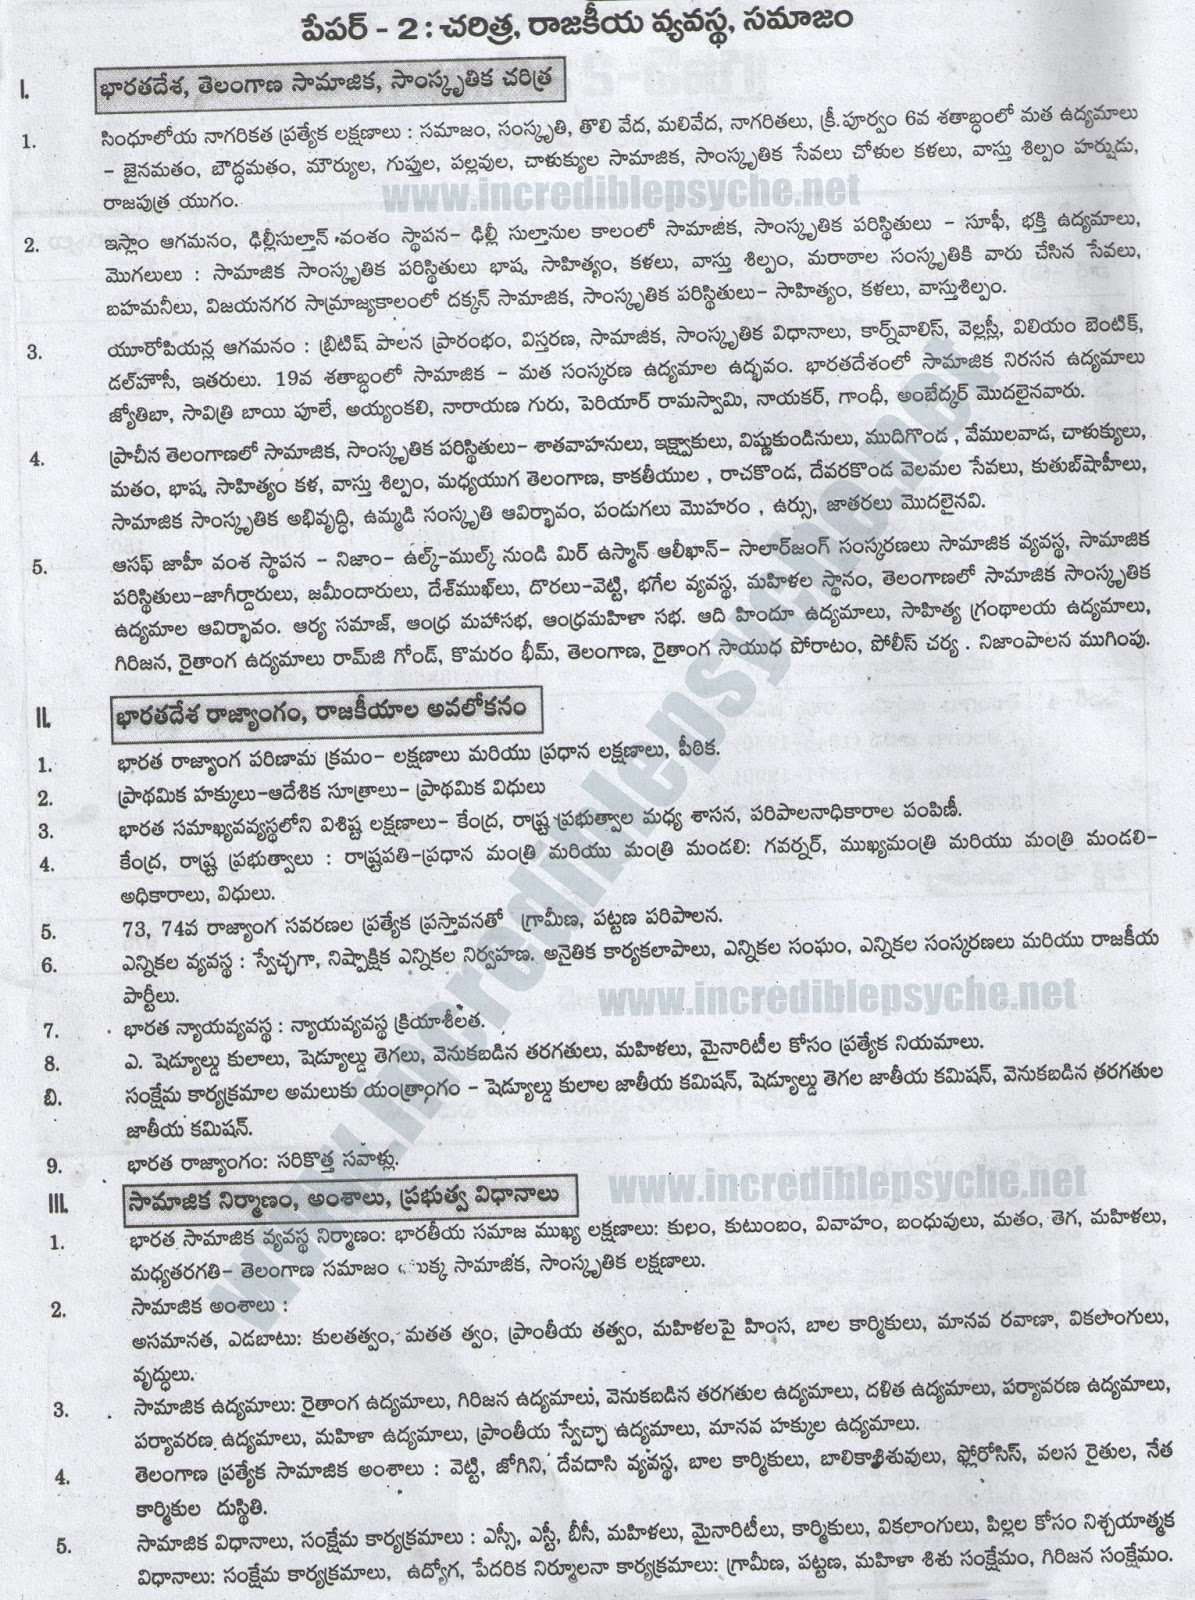 telangana tspsc group 2 exam syllabus in telugu with scheme of exam pattern detailed pattern 2